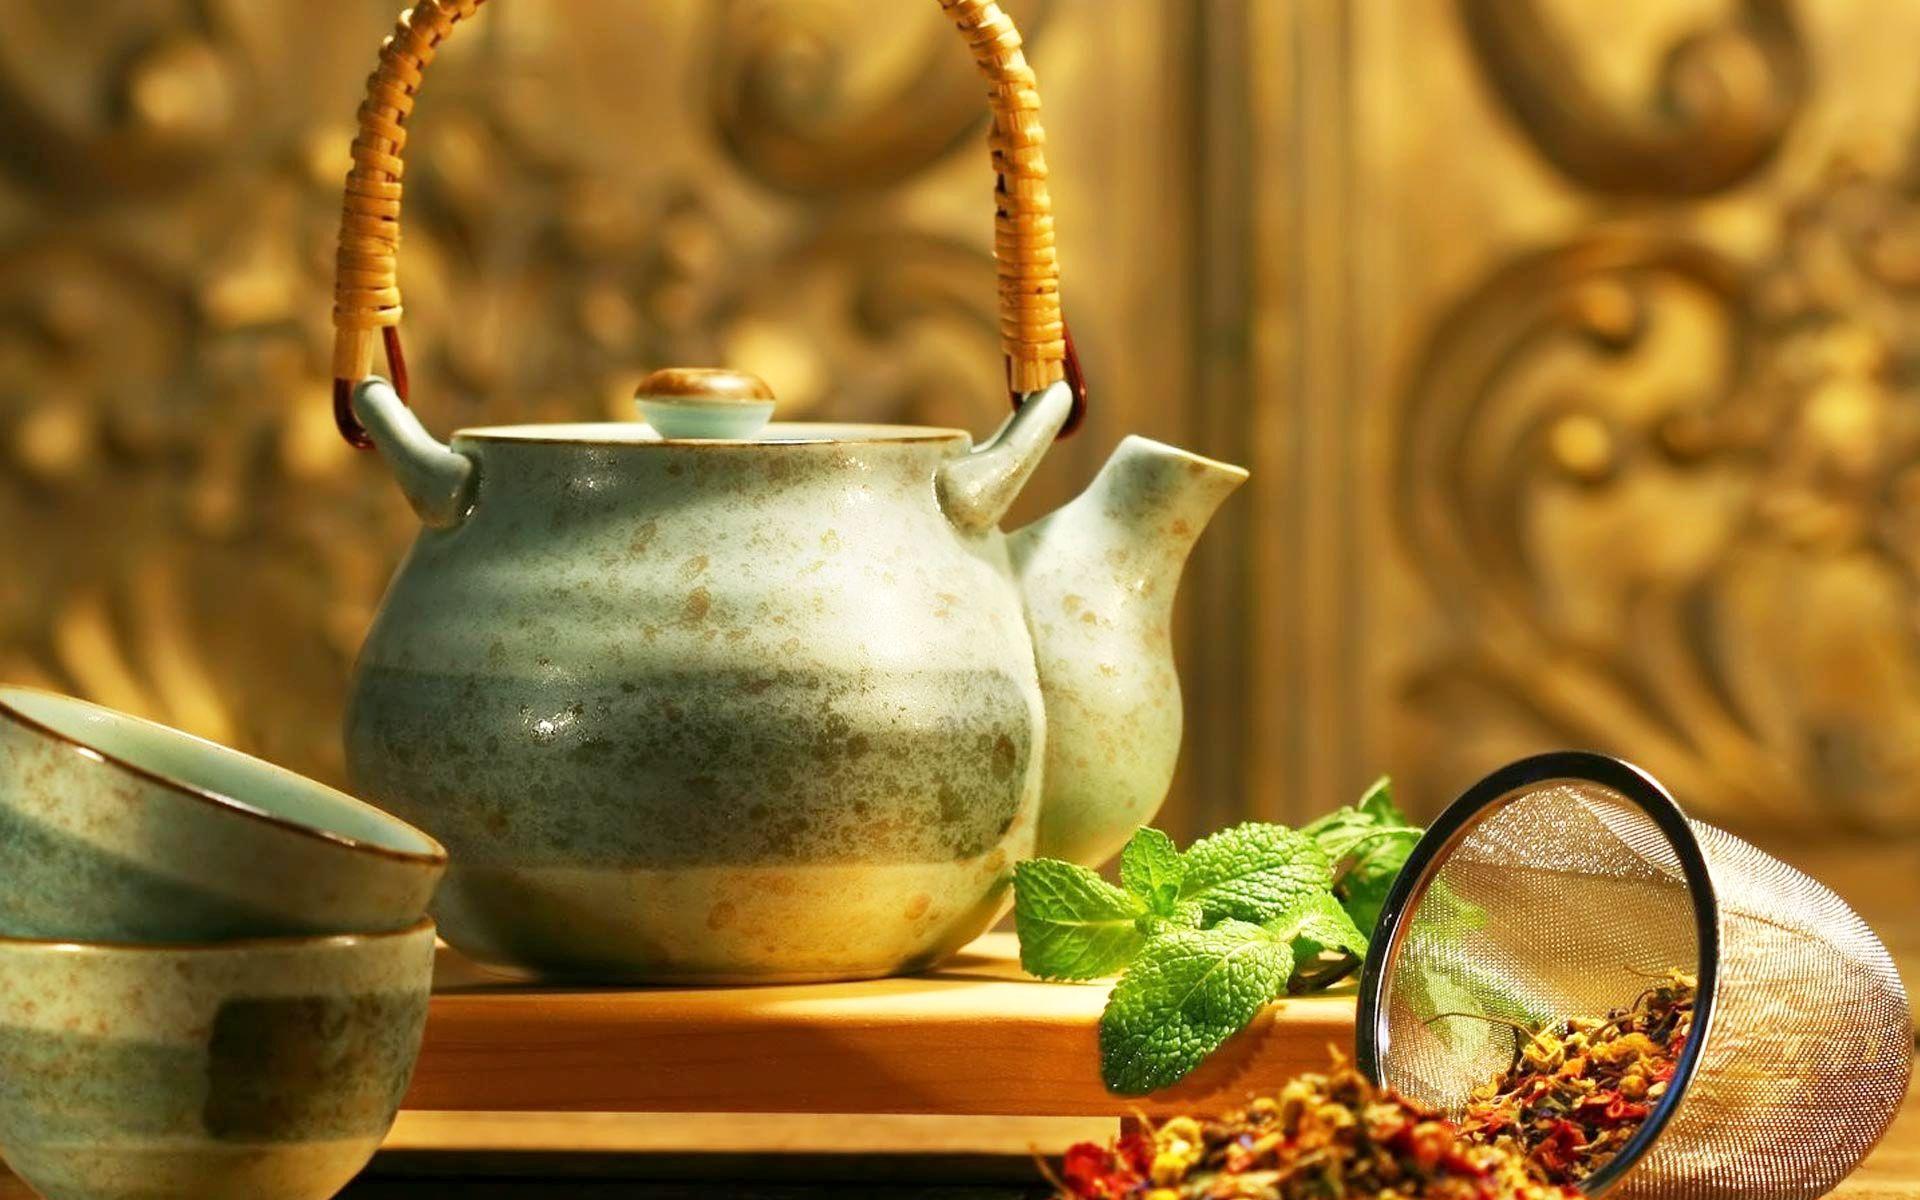 Ceai rosu Rooibos previne diabetul, sustine somnul odihnitor, elimina pietrele la rinichi si nu contine cofeina